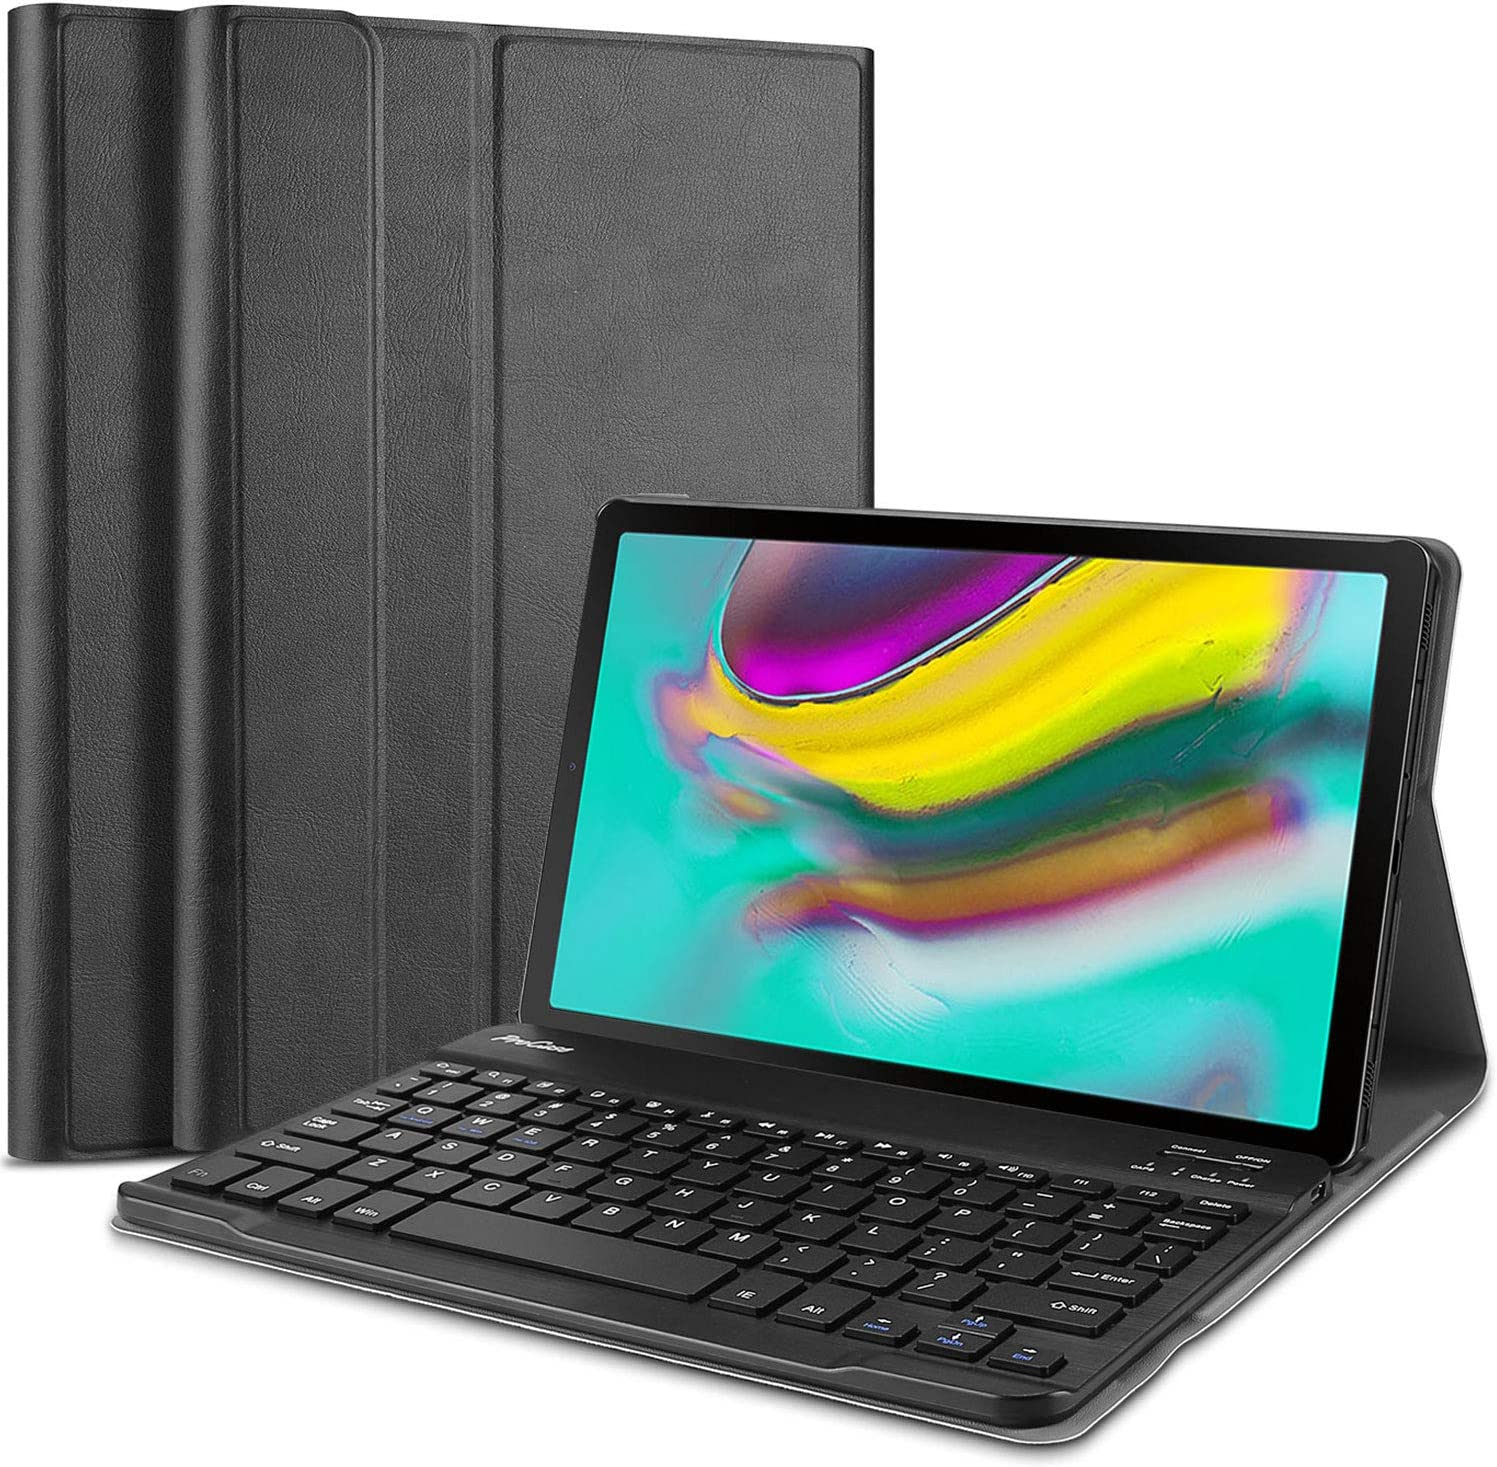 ProCase US Engelse toetsenbordhoes voor Galaxy Tab S5e